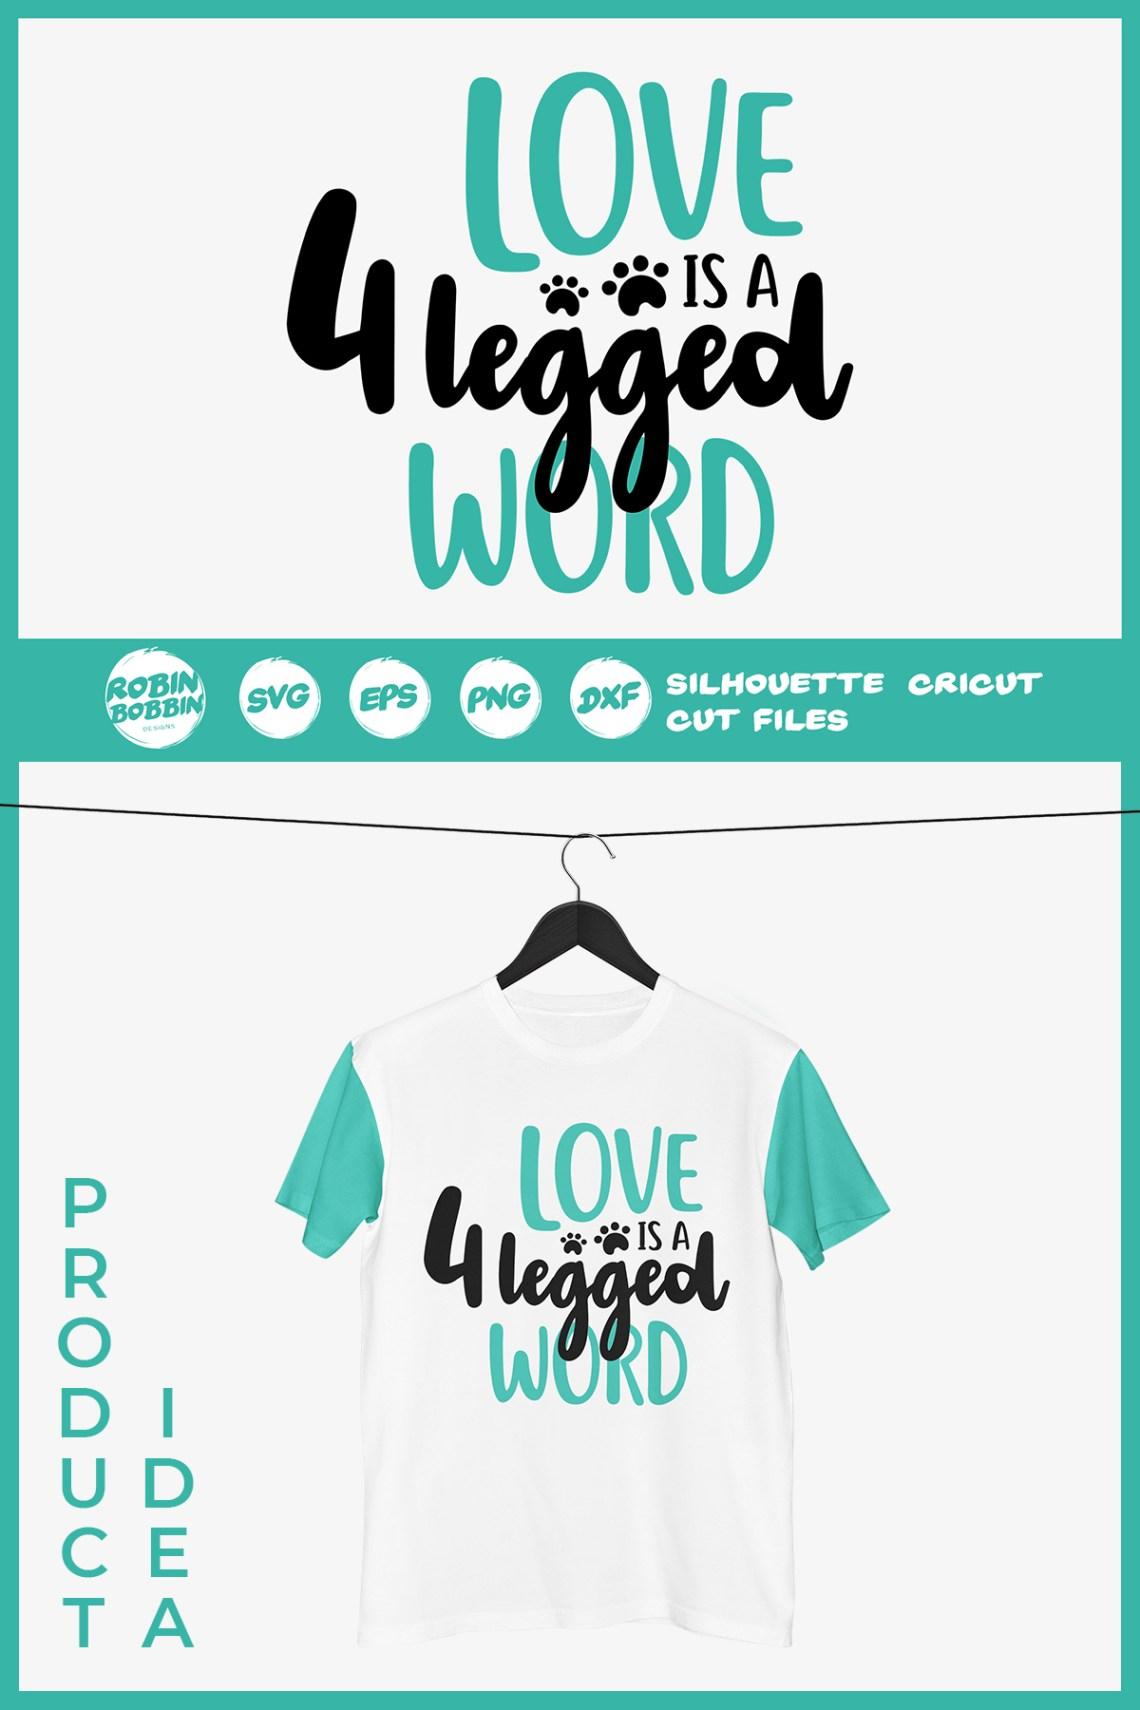 Download Love is A 4 Legged Word SVG - Dog Lover SVG File (292643 ...